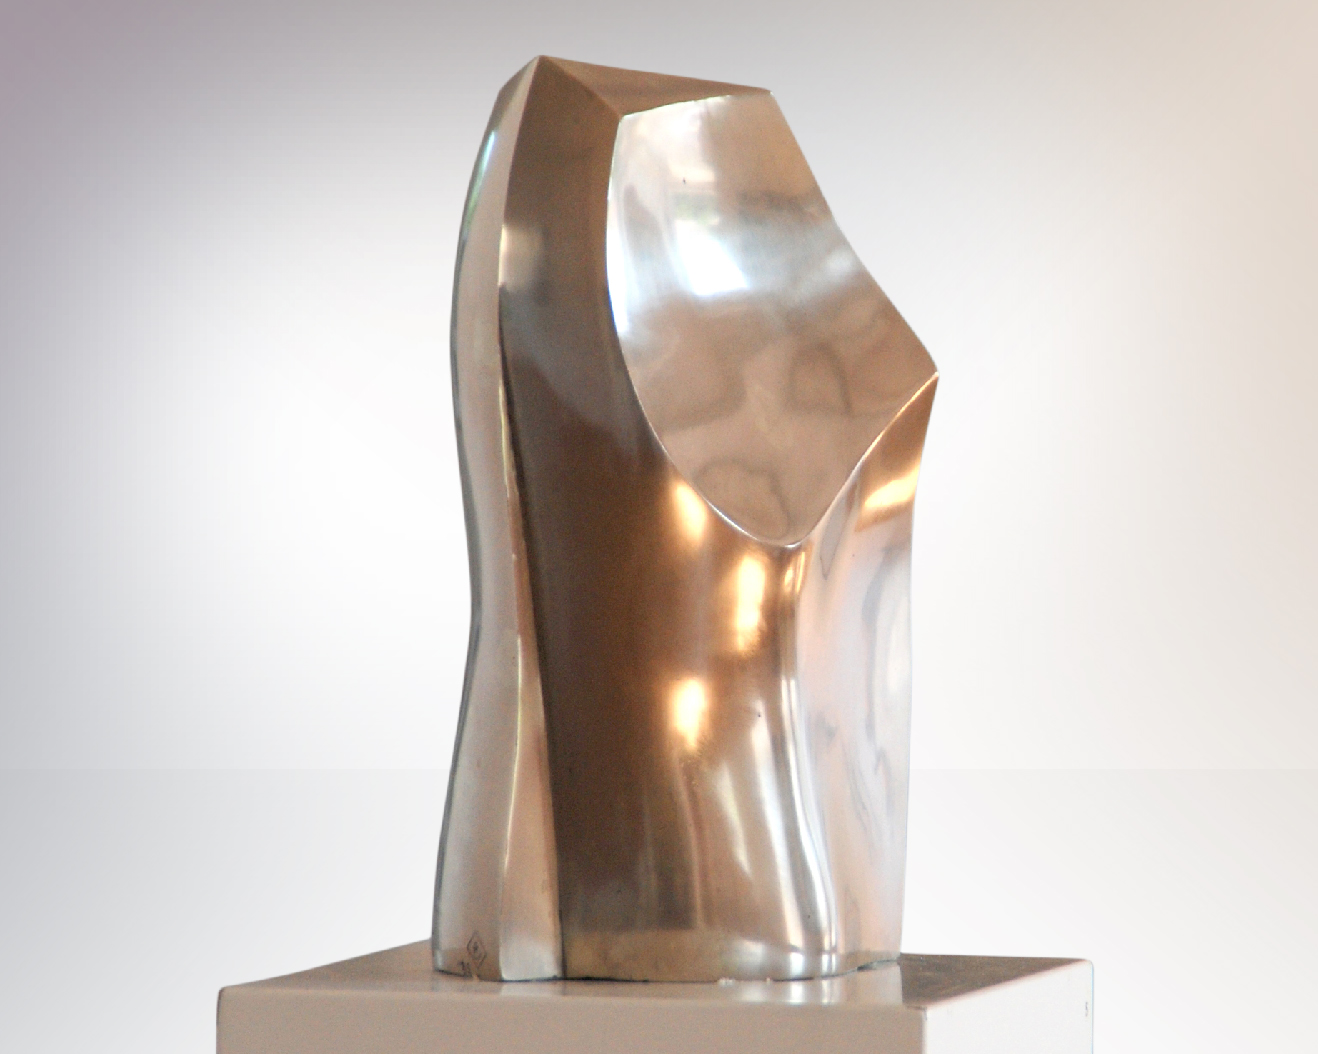 Phönix I, sculpture en argentan, alliage de cuivre, de nickel et de zinc, 34 x 13 x 21 cm